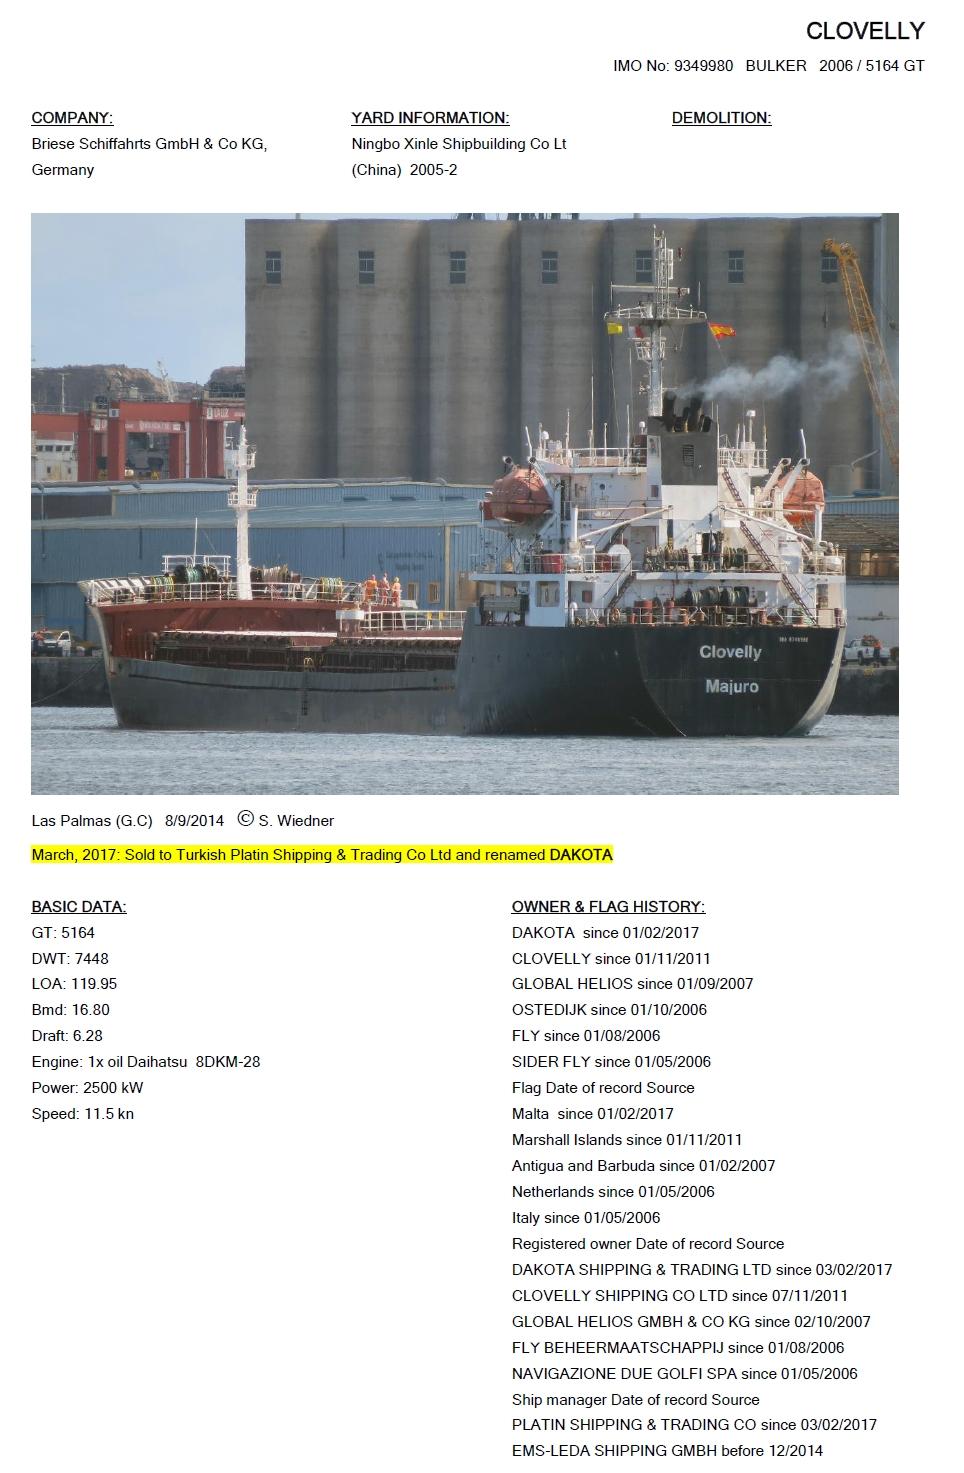 Cargo Vessels International Non Commercial Shipping Research 282500 Clovelly Imo 9349980 2006 5164 Gt 7448 Dwt Ningbo Xinle 2005 2 Daihatsu 8dkm 28 2500 Kw Dakota 2017 2011 17 Global Helios